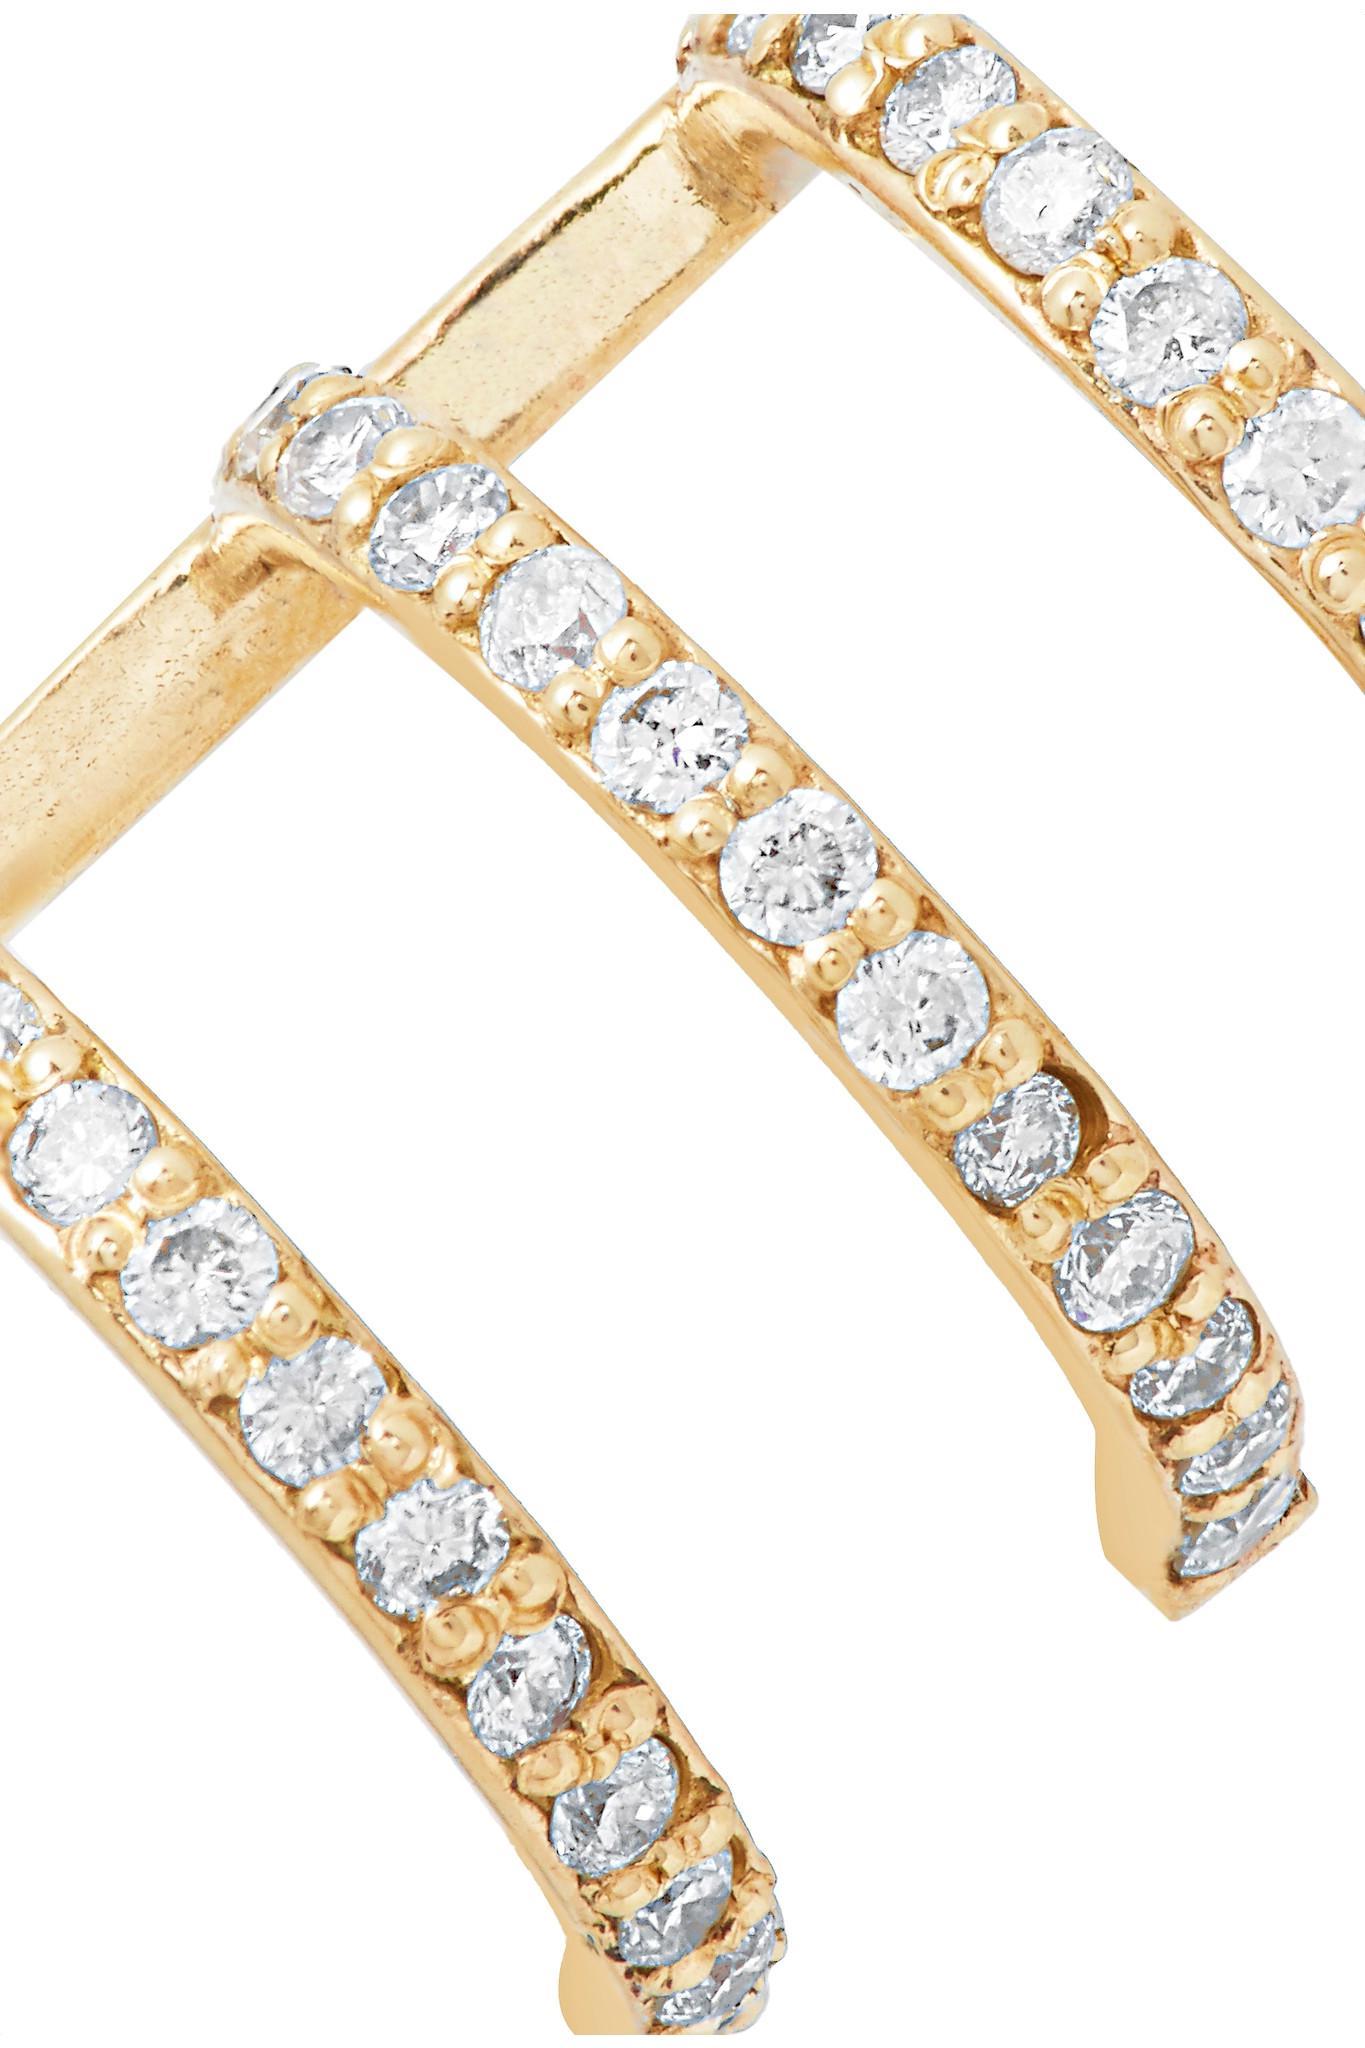 Beaufille Ringlet 10-karat Gold Diamond Earring U1FQnz5